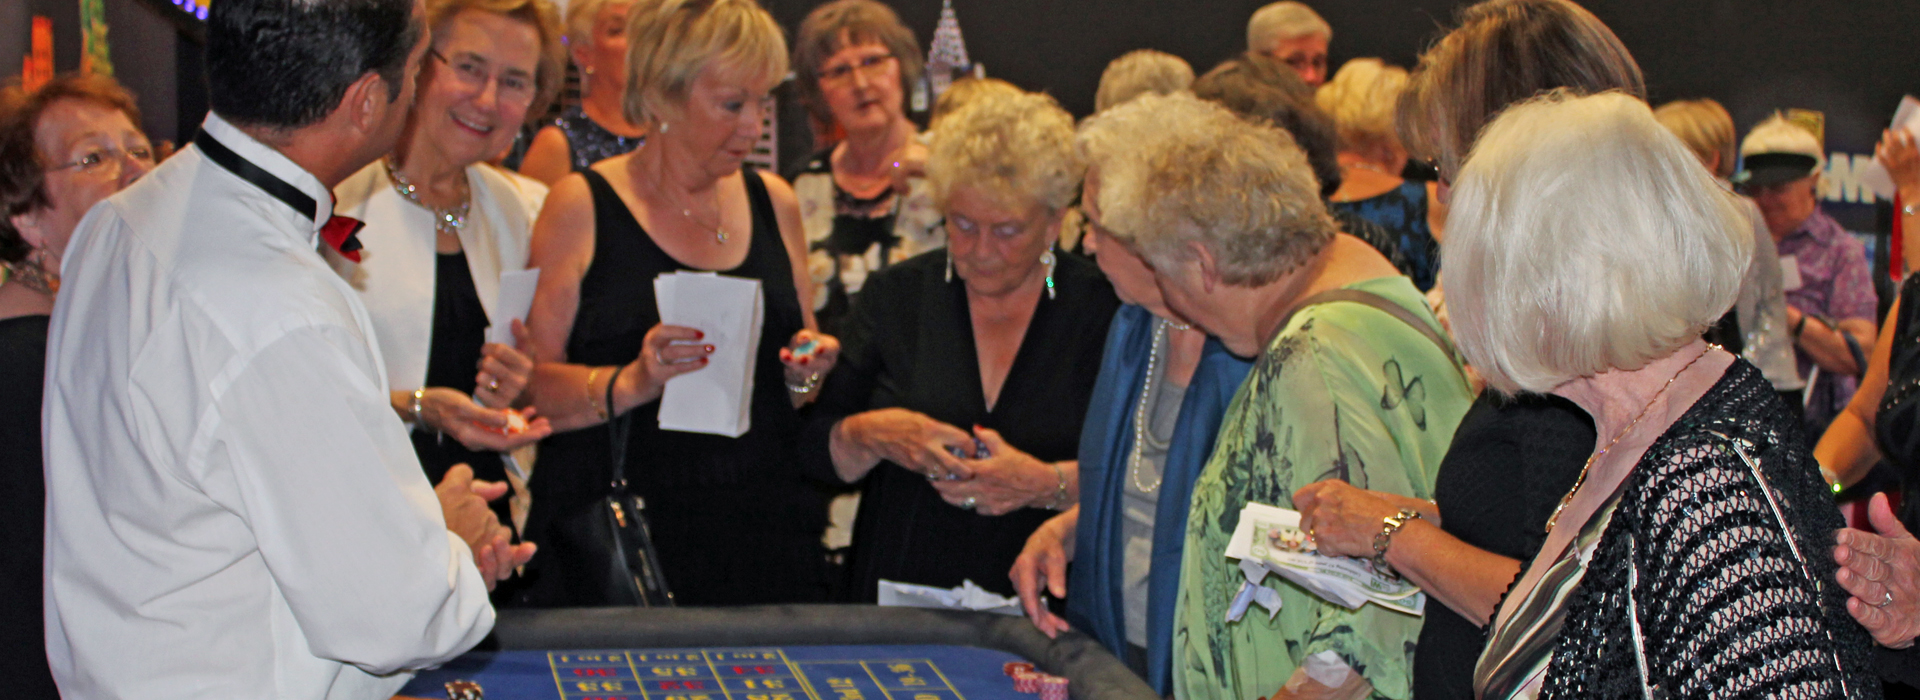 casino clubs